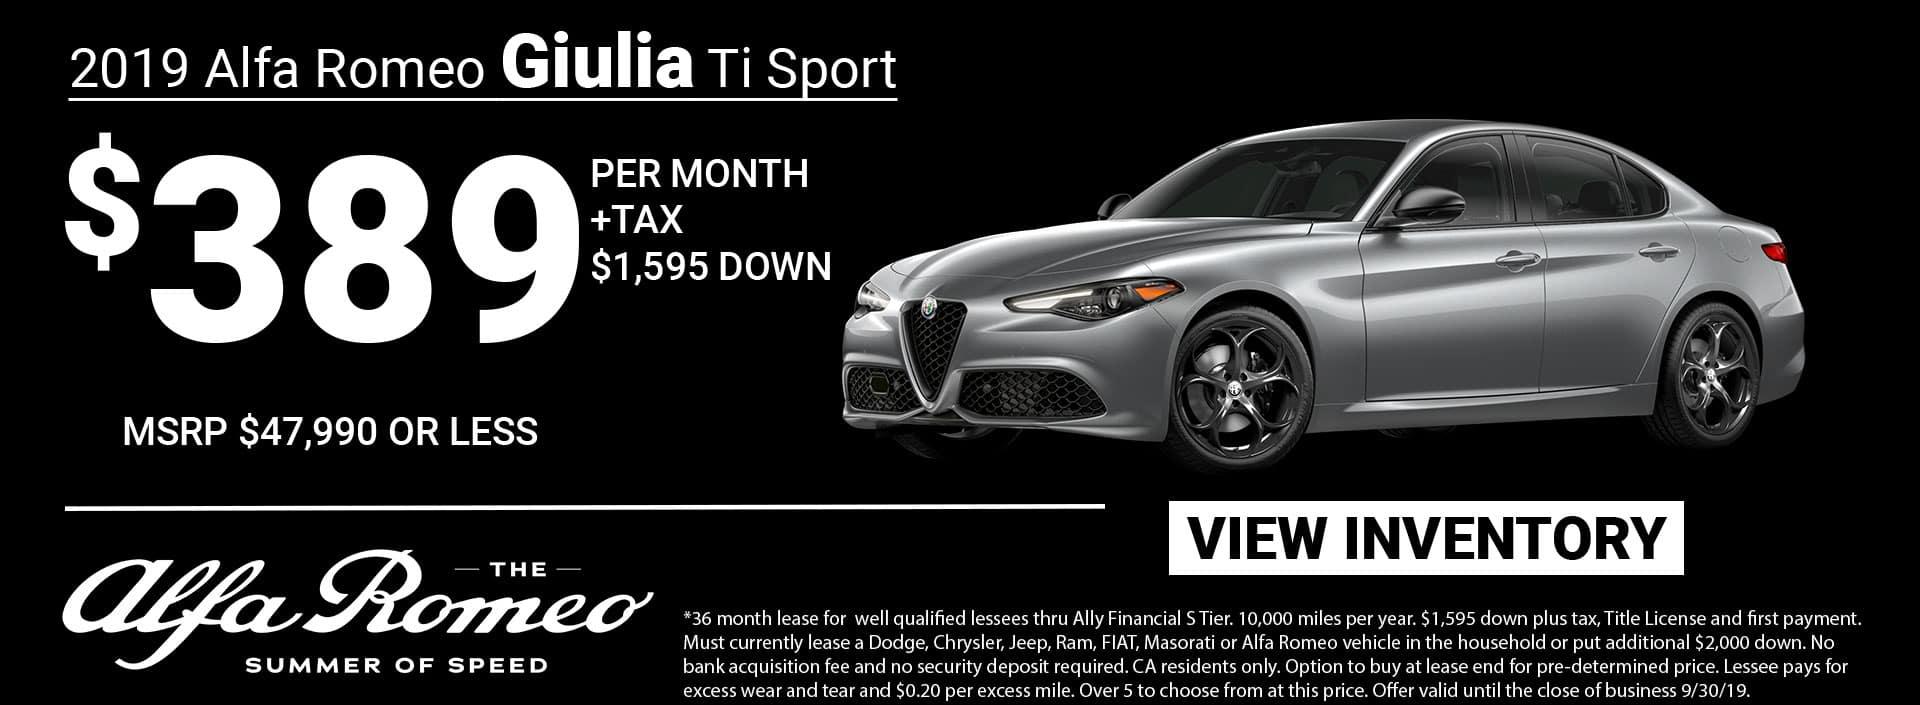 Giulia Ti Sport Lease